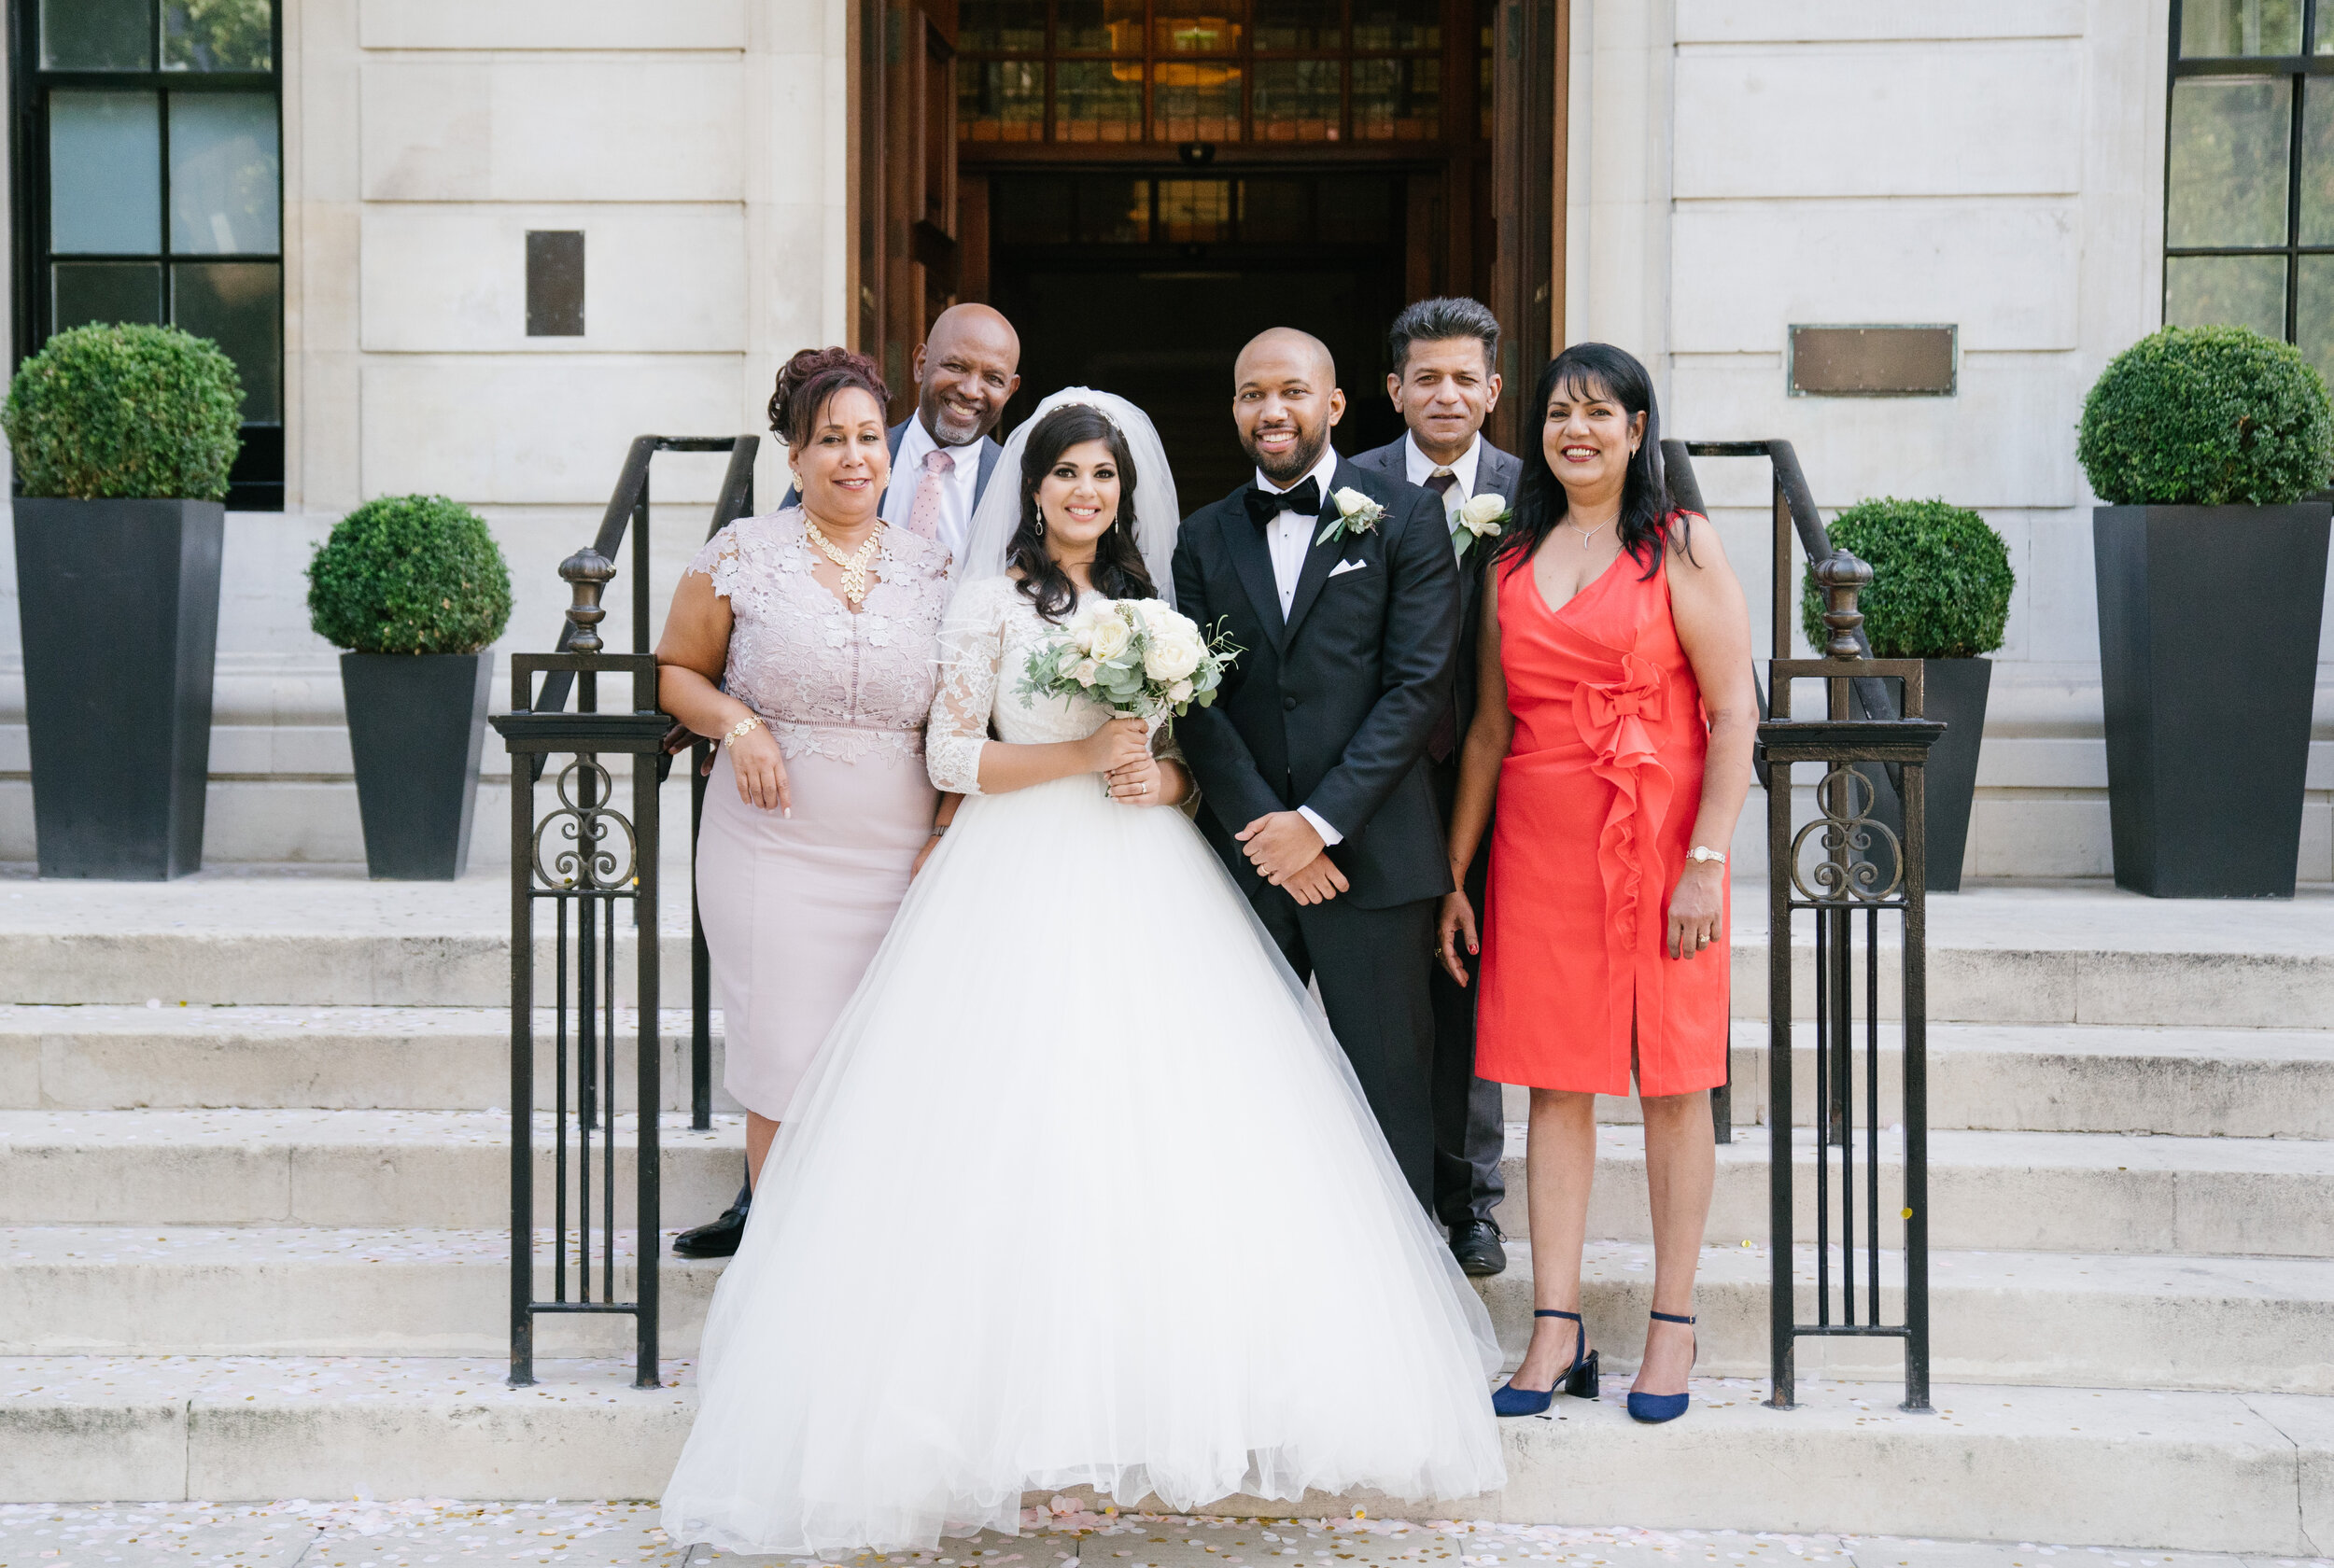 east-london-wedding-photographer-videographer-patriot-square-apartments-62